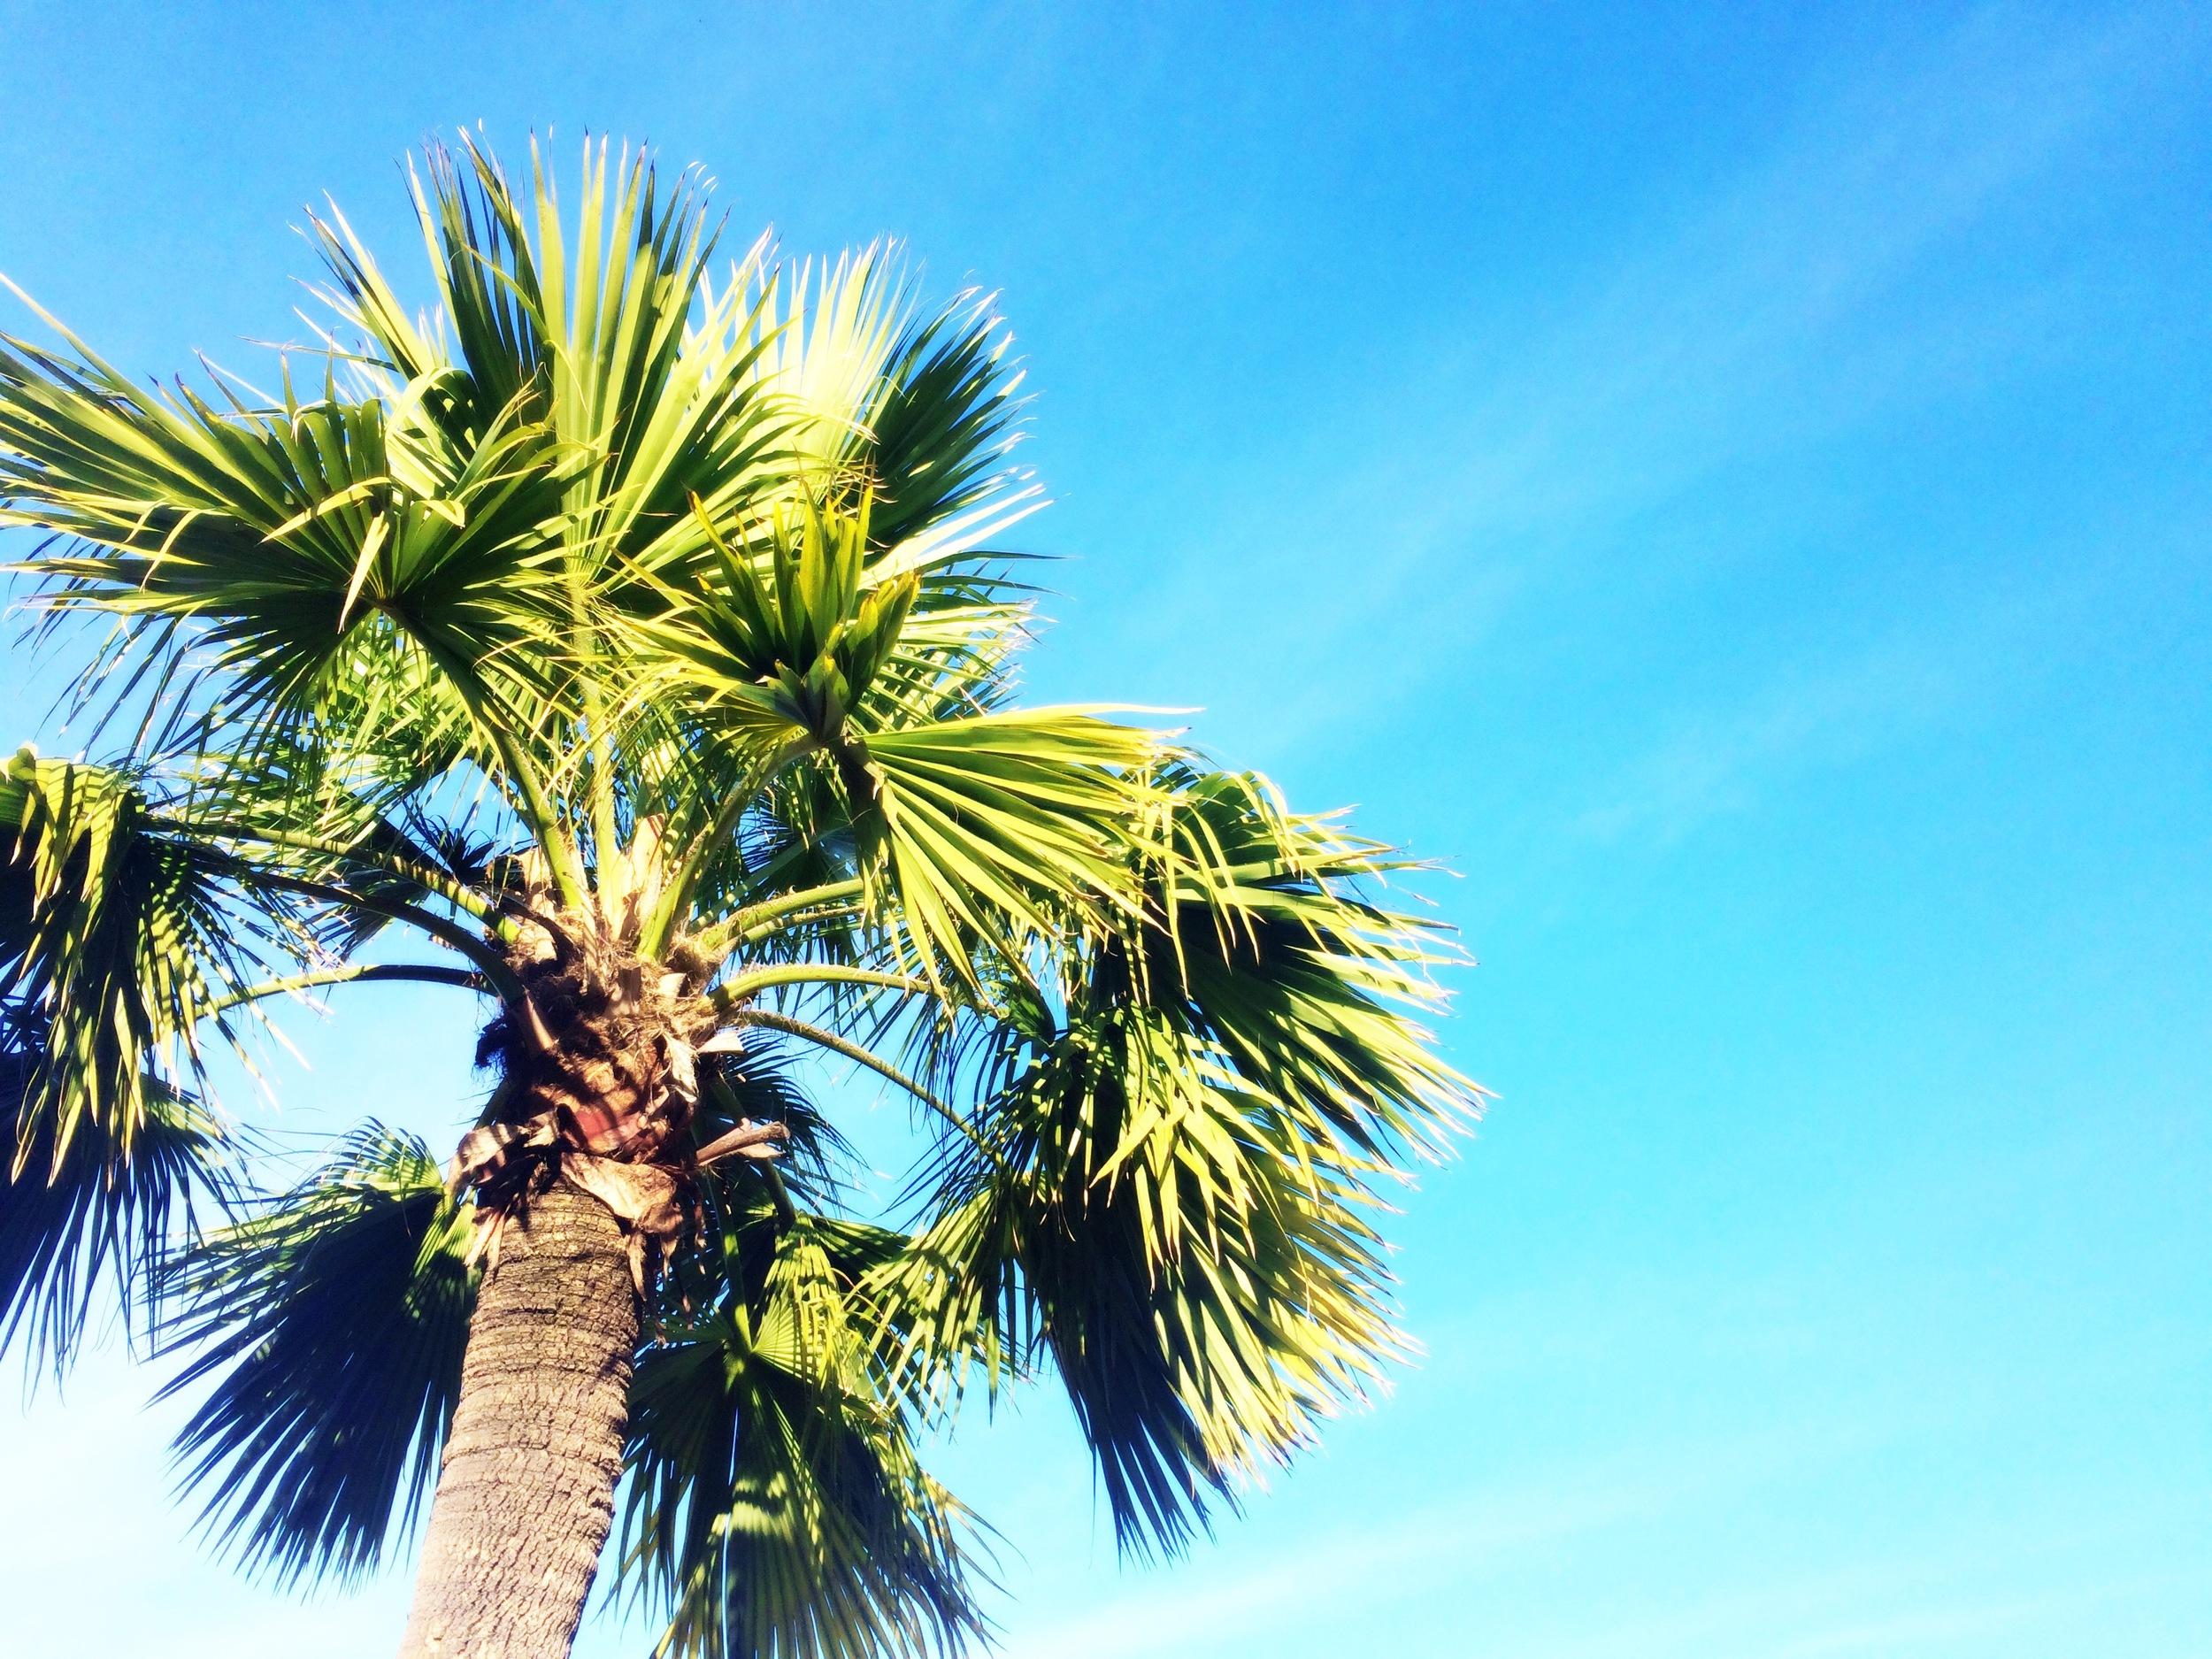 california palm tree blue sky